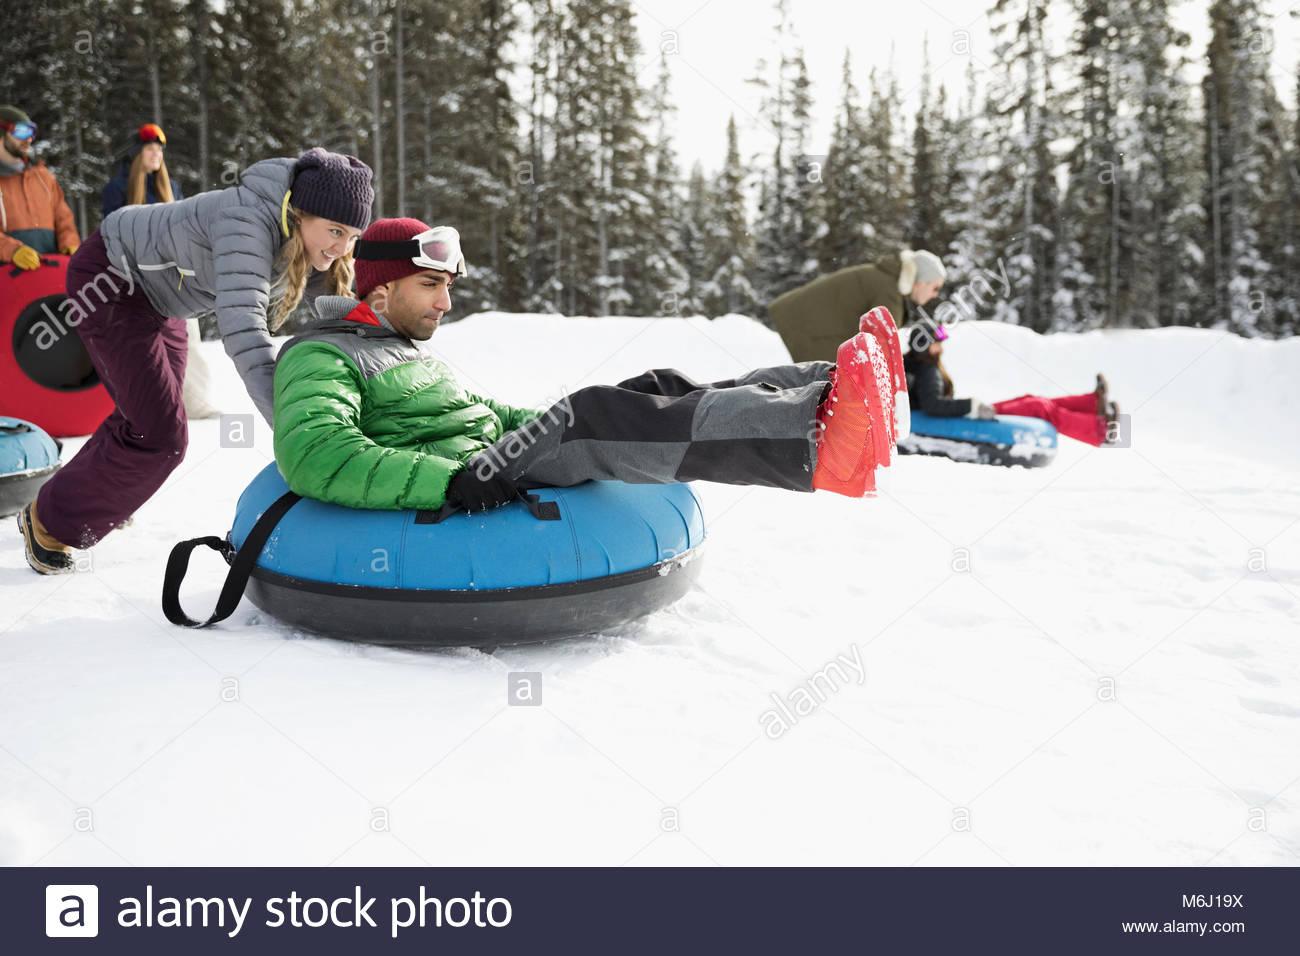 Friends racing, inner tubing in snow - Stock Image